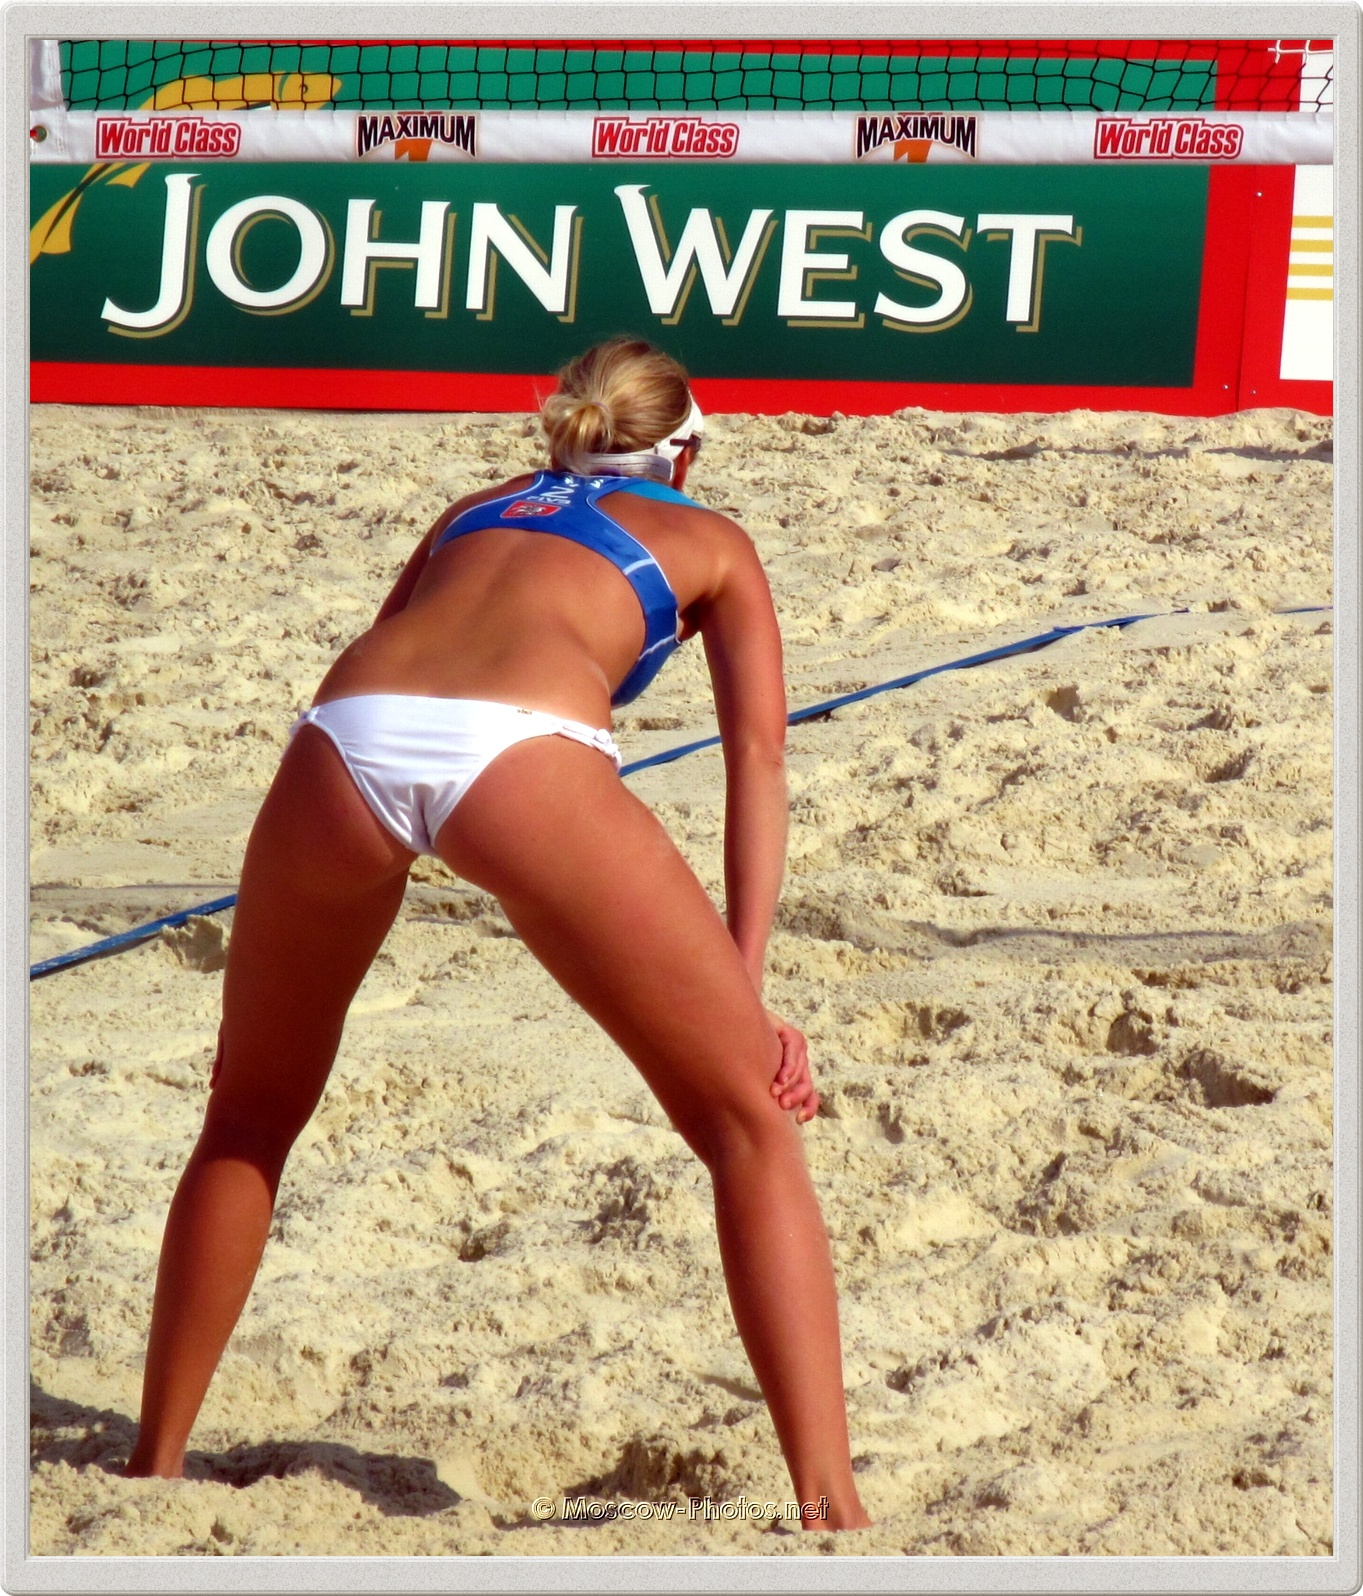 Russian Beach Volleyball Player Evgenia Ukolova